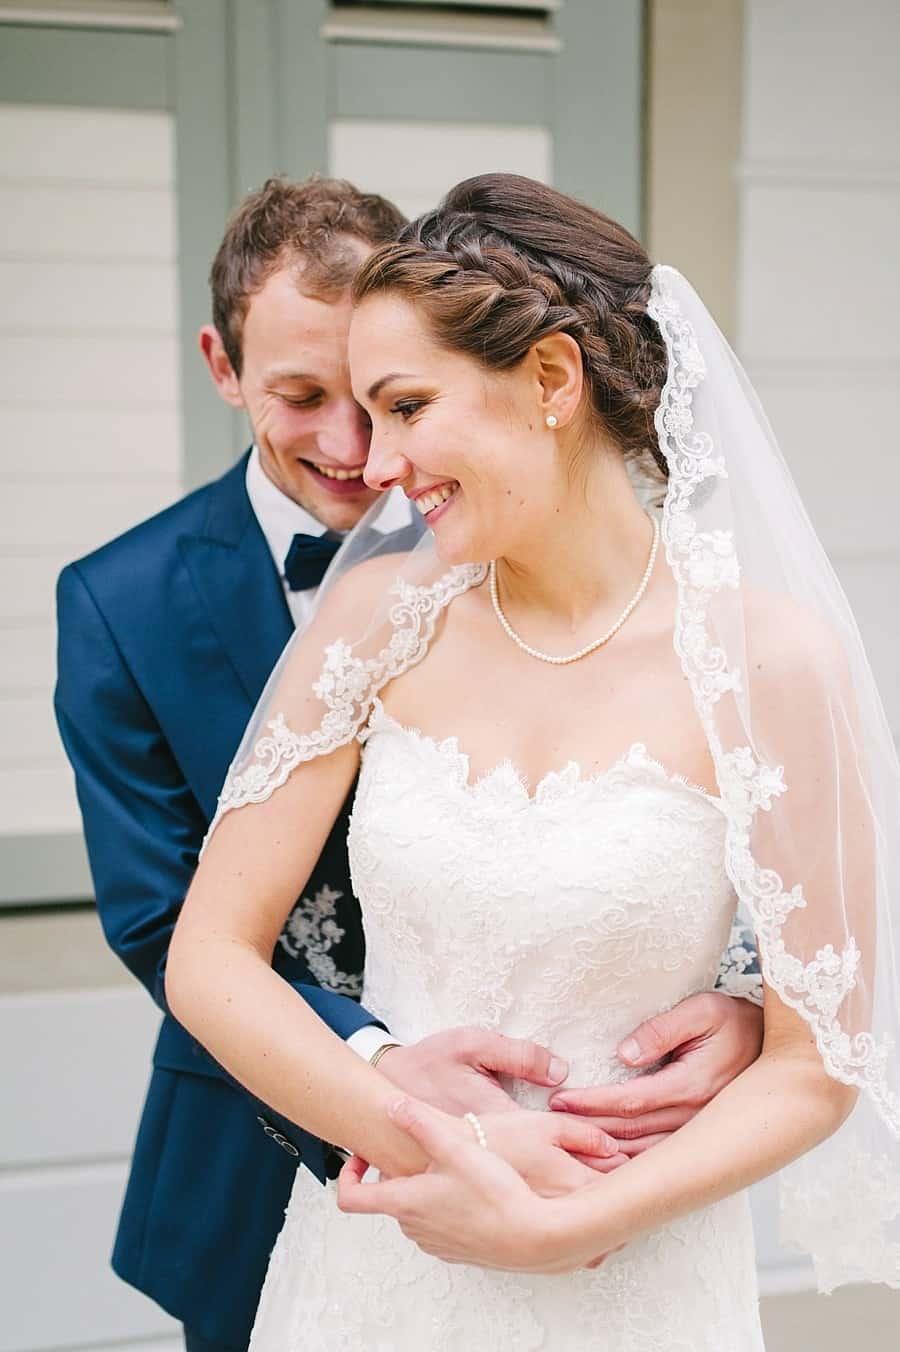 hochzeitsfotograf_thomasschwede_after_wedding_fotos_auf_fehmarn_0304